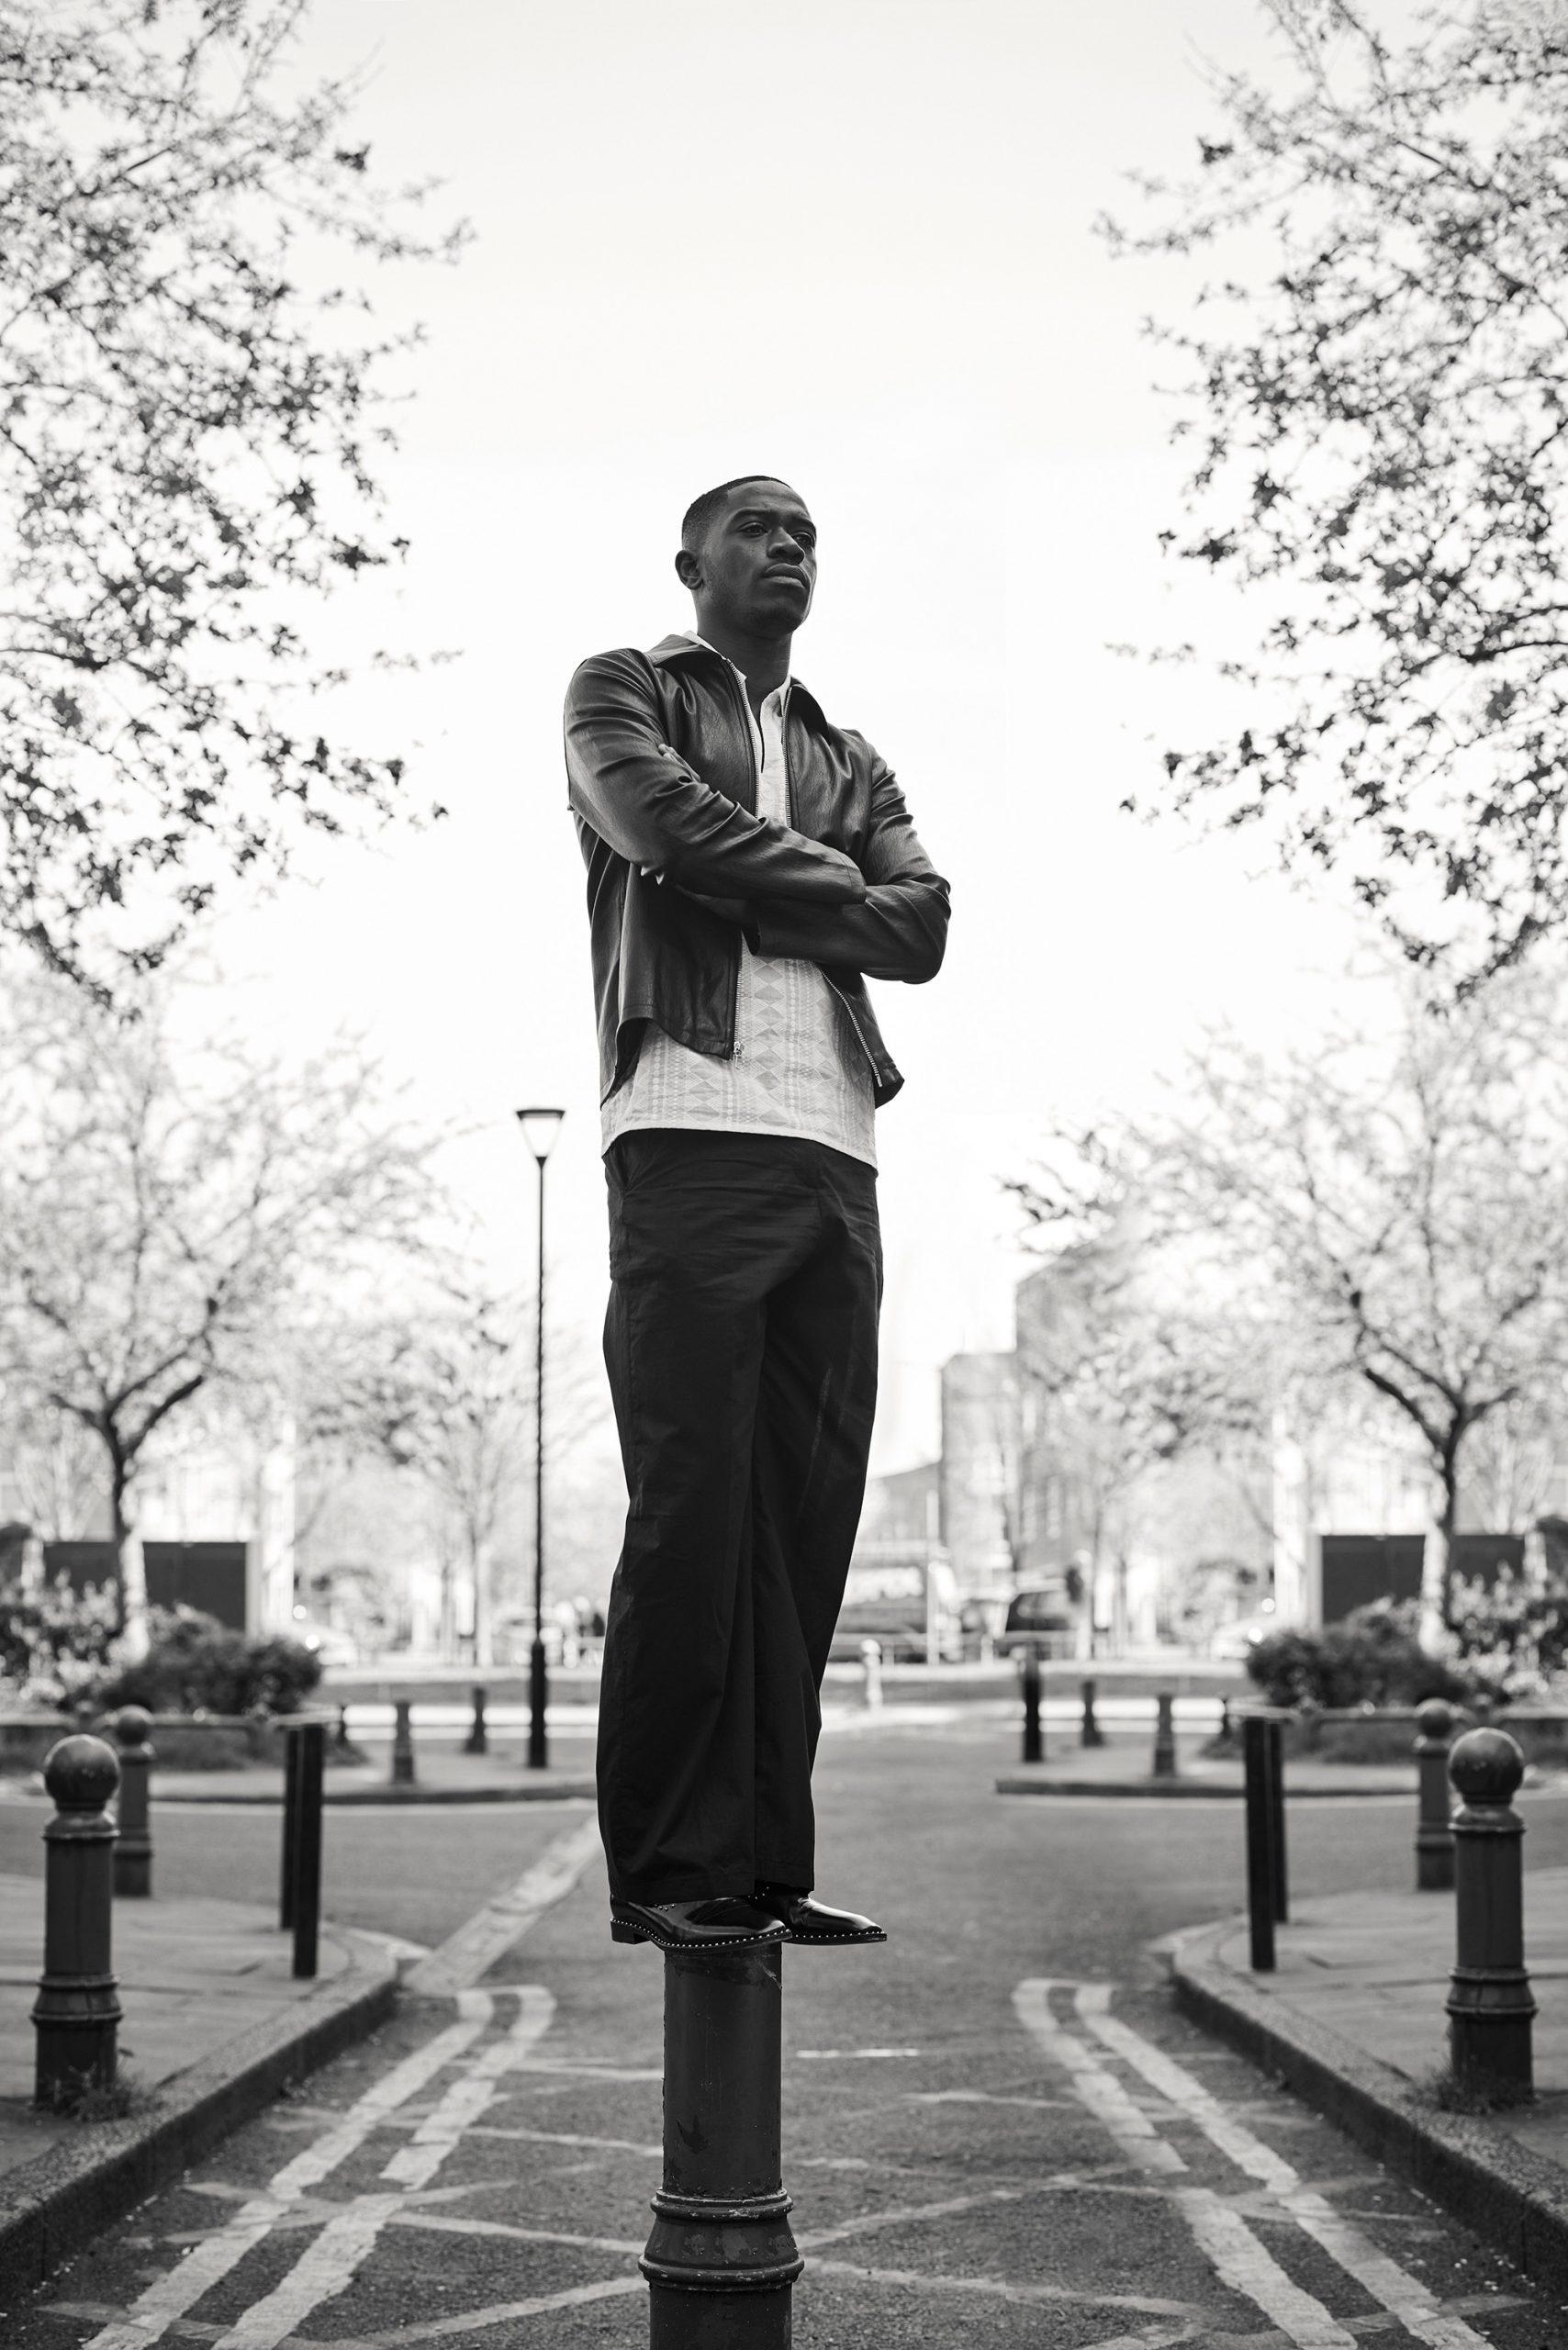 Damson Idris stood on a bollard with his arms crossed